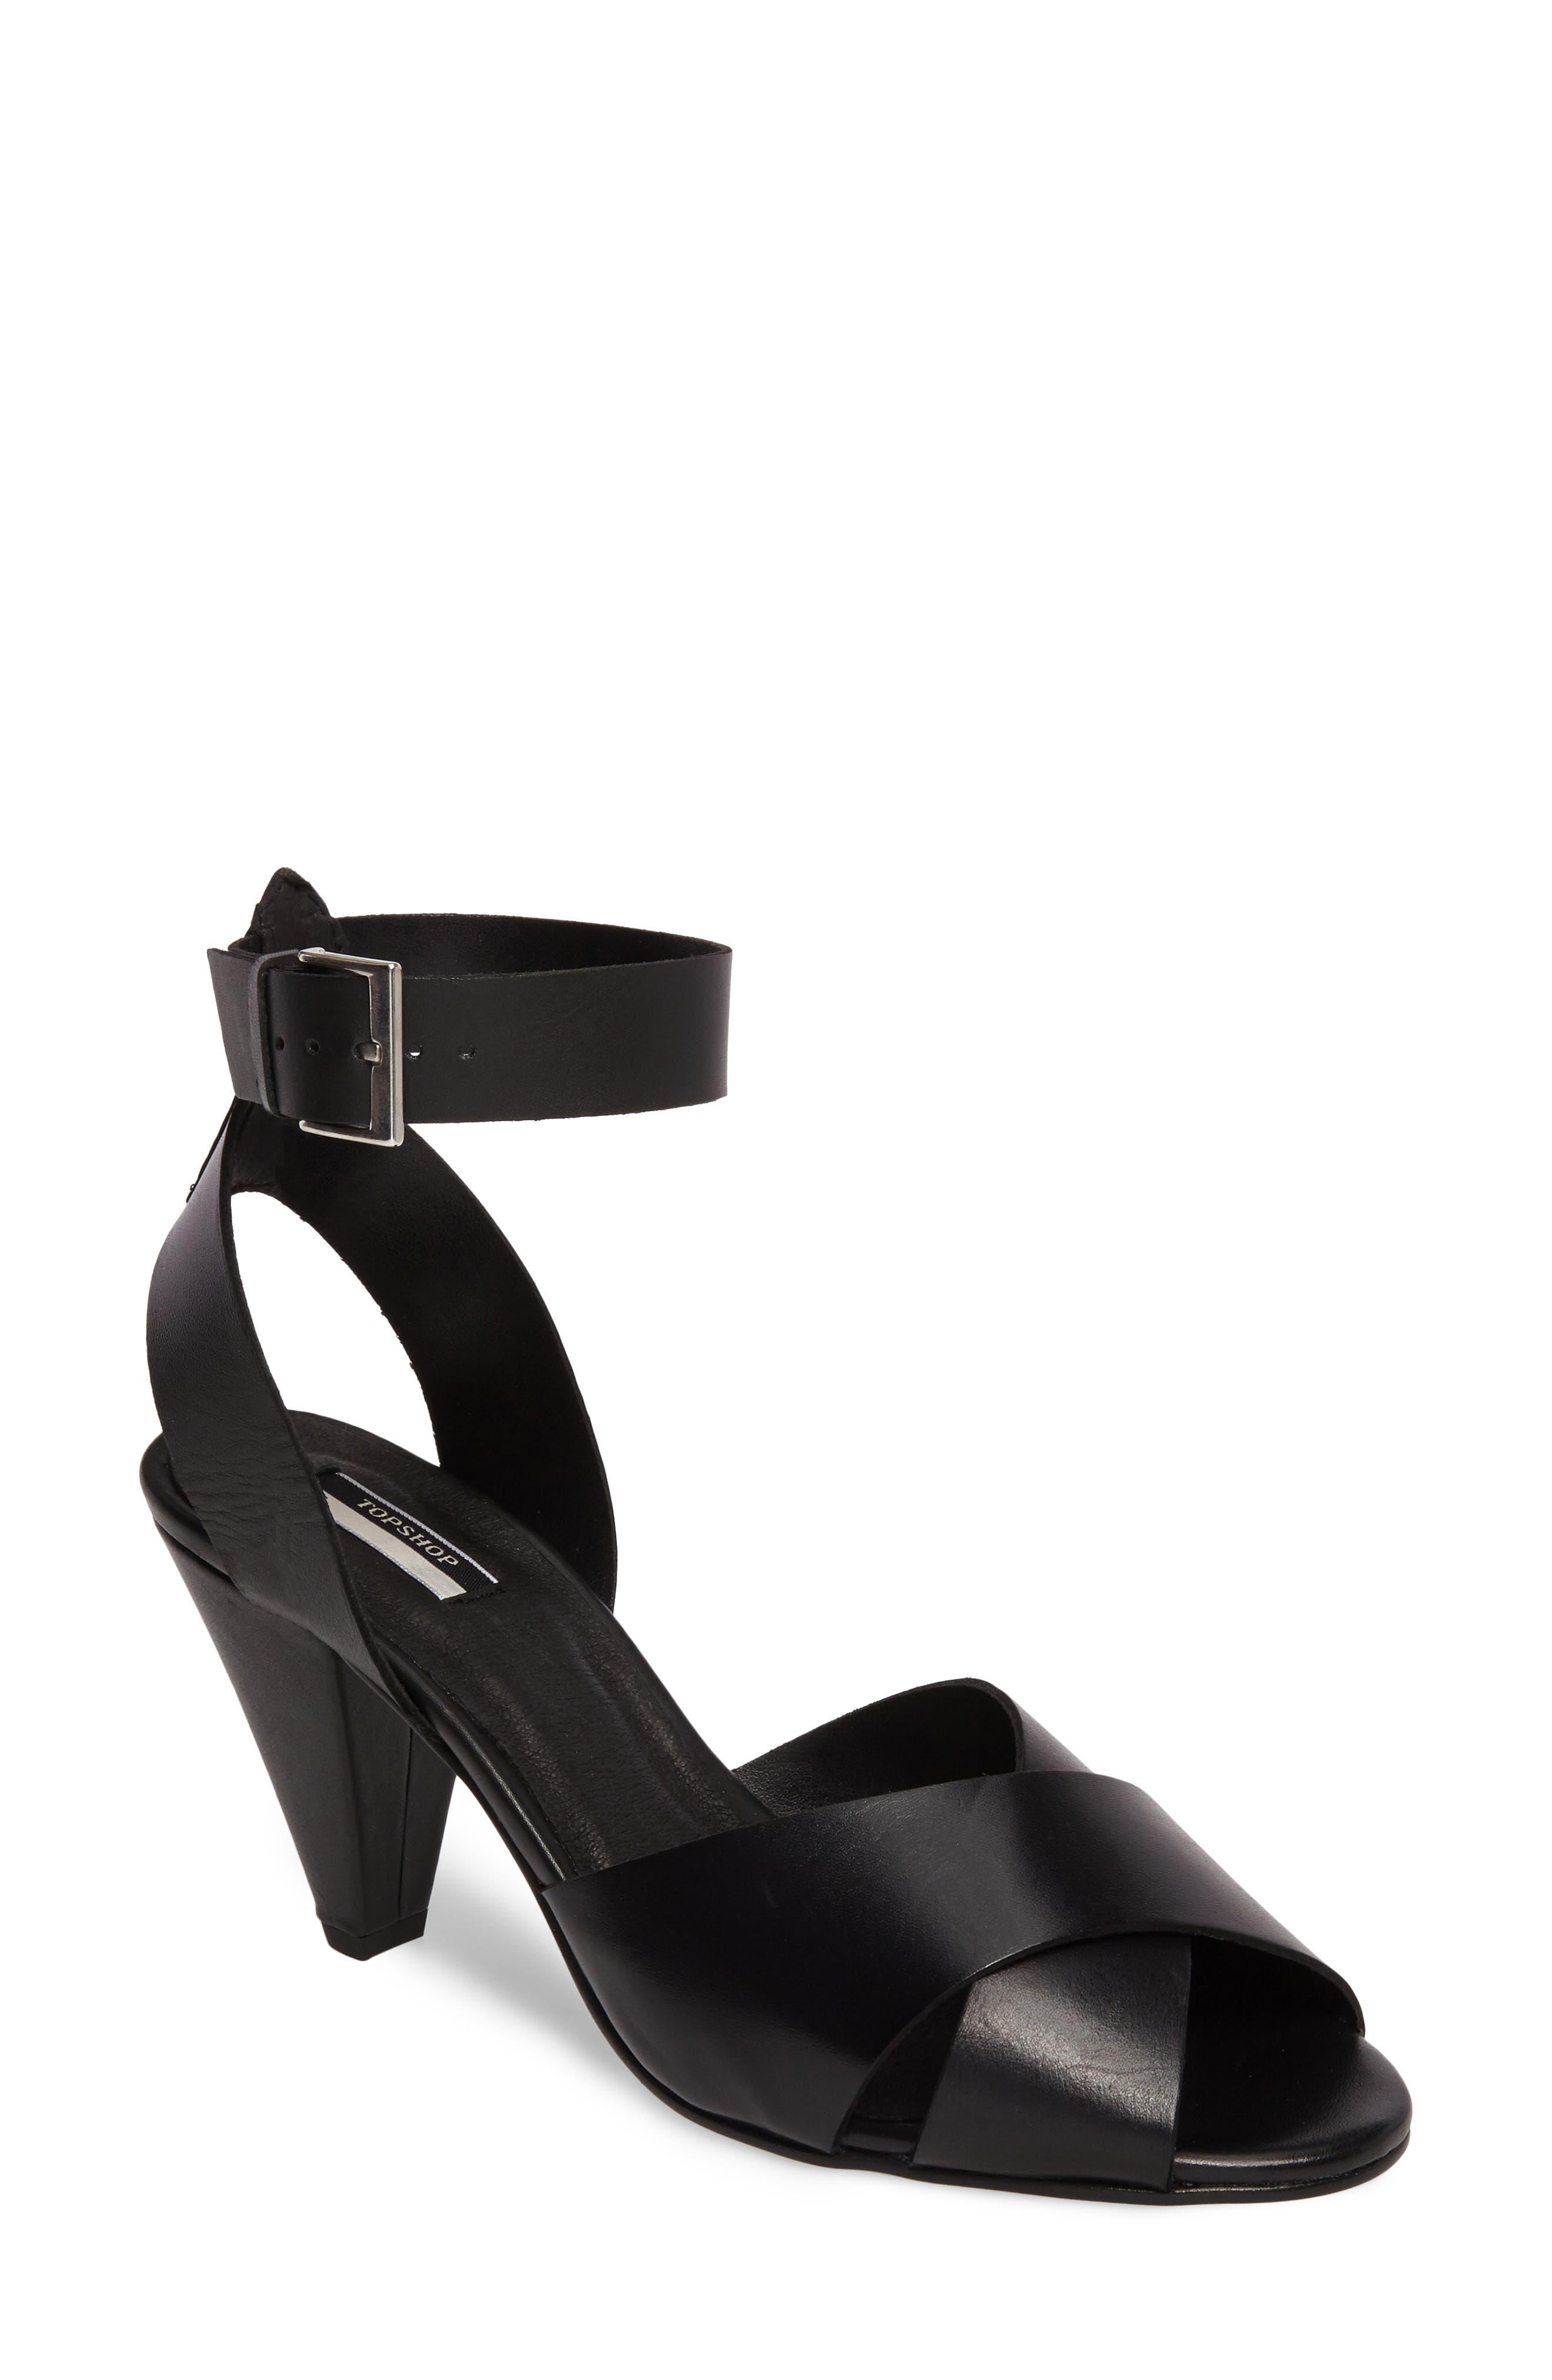 Nazia Statement Heel Sandal,                         Main,                         color, 001